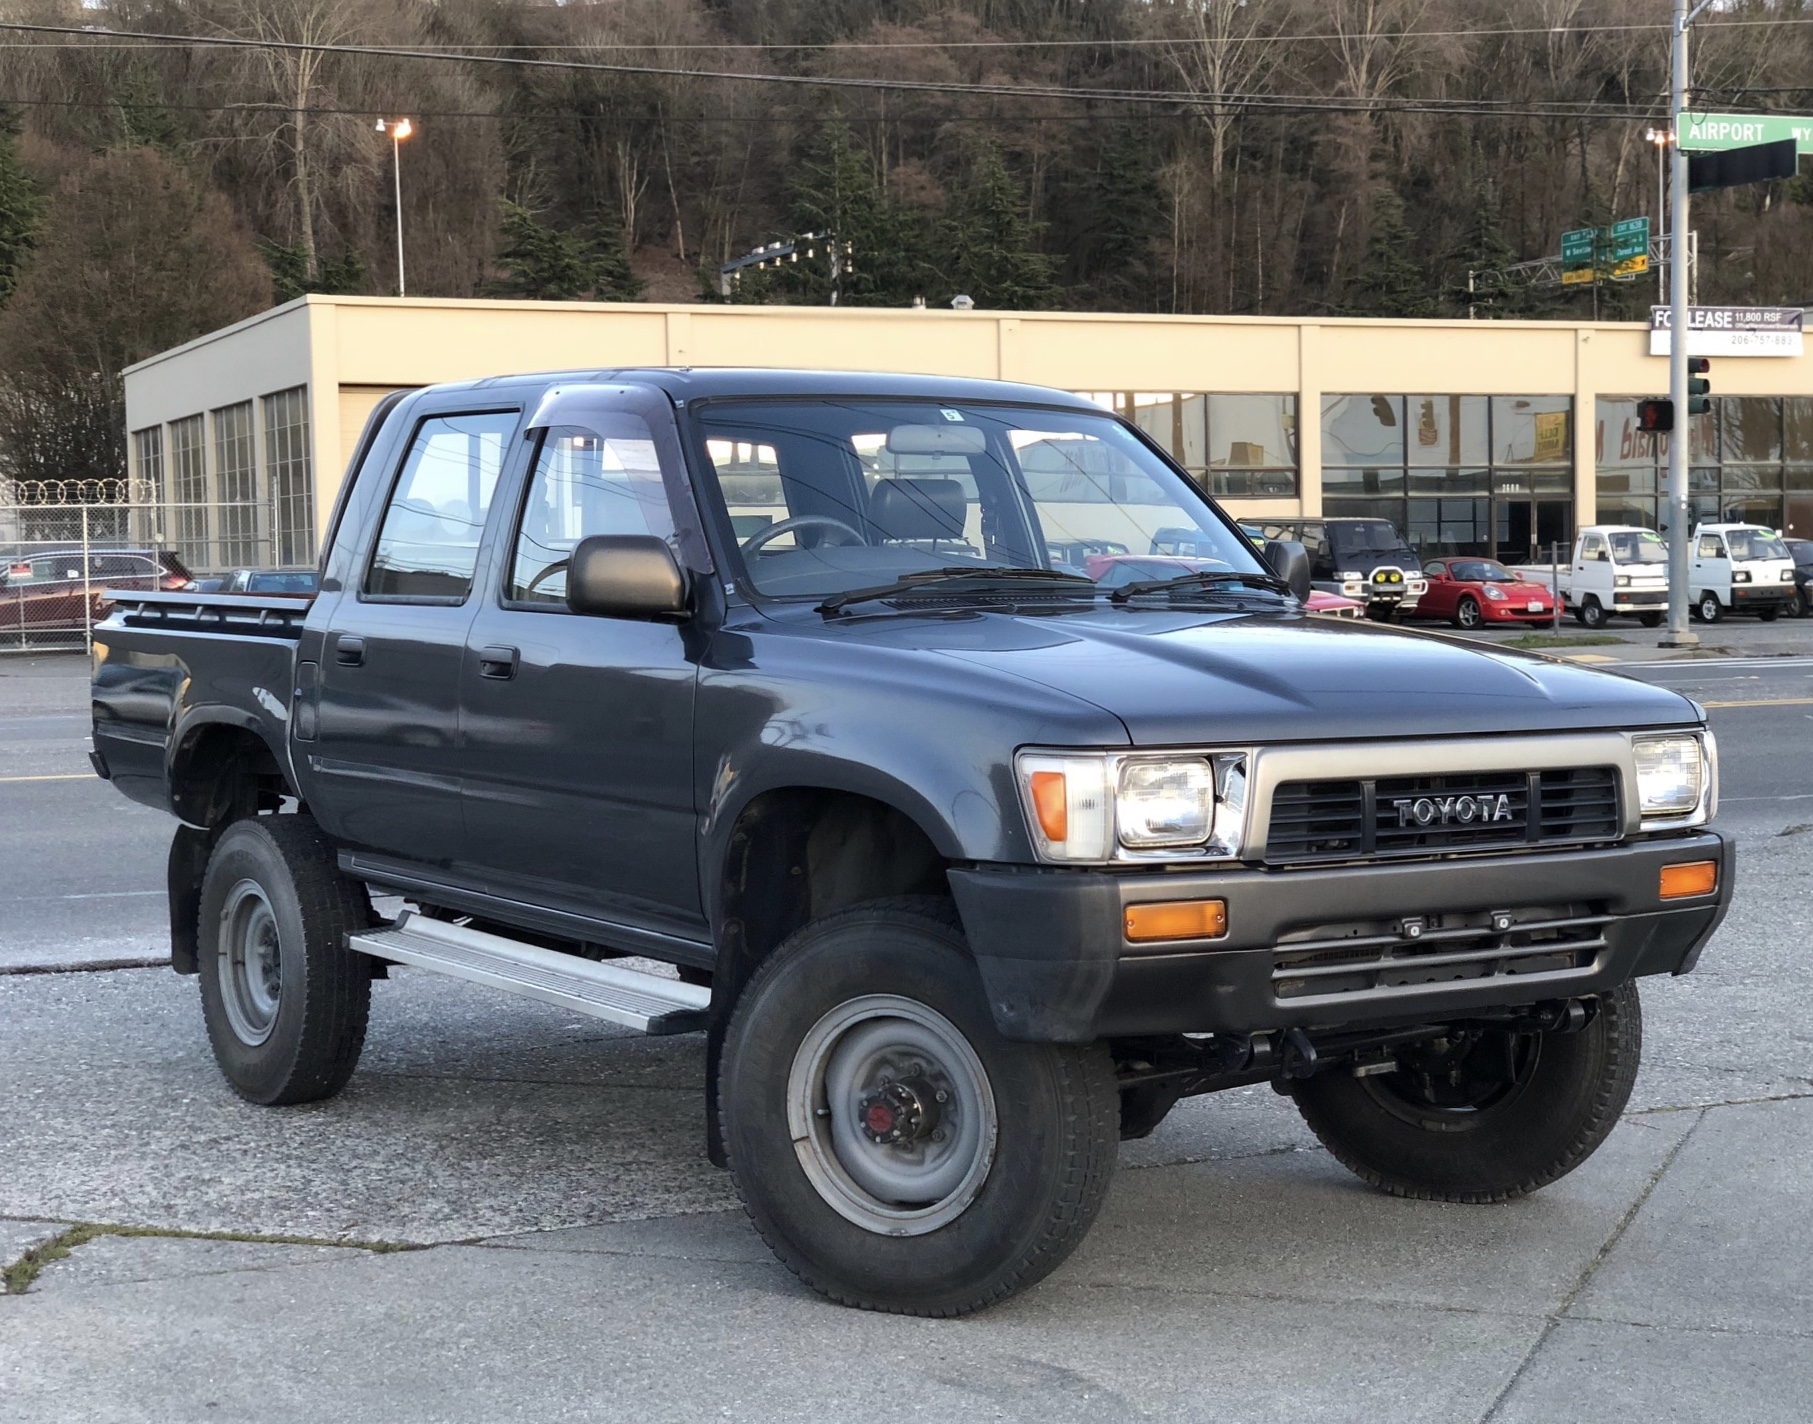 1990 Toyota Hilux double-cab 4x4 - AdamsGarage - SODO-MOTO